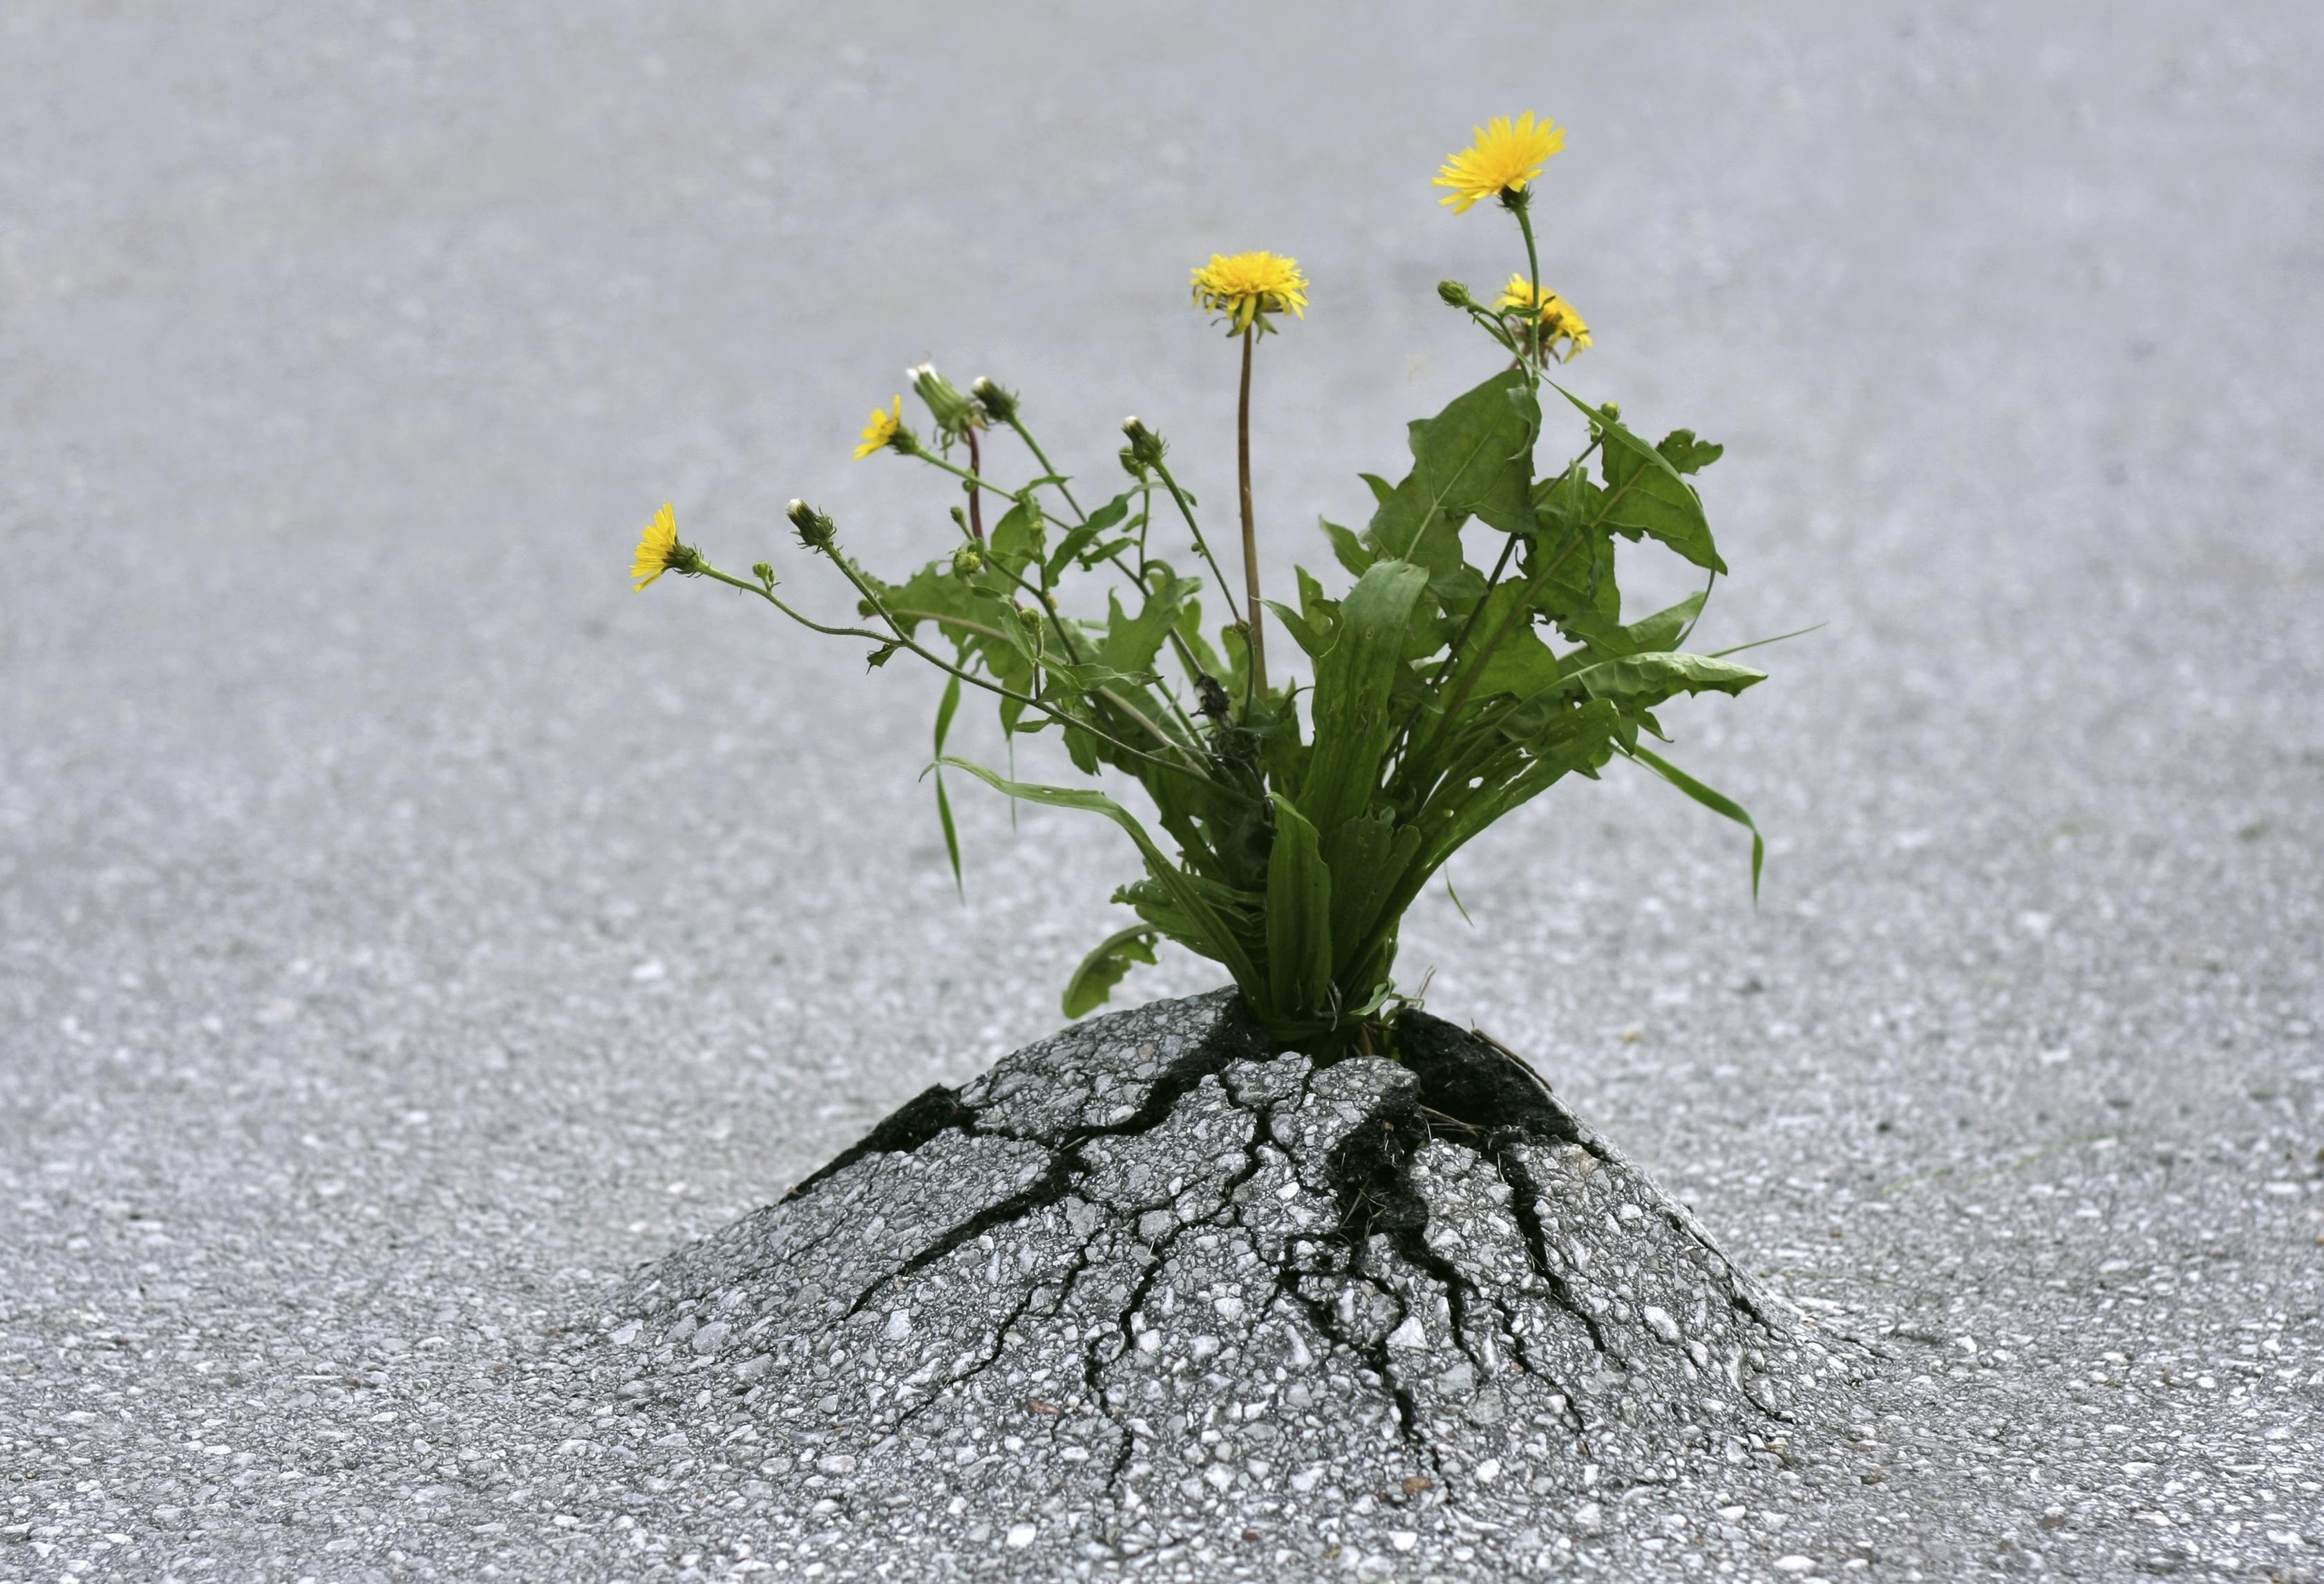 resilience-dandelion-through-asphalt